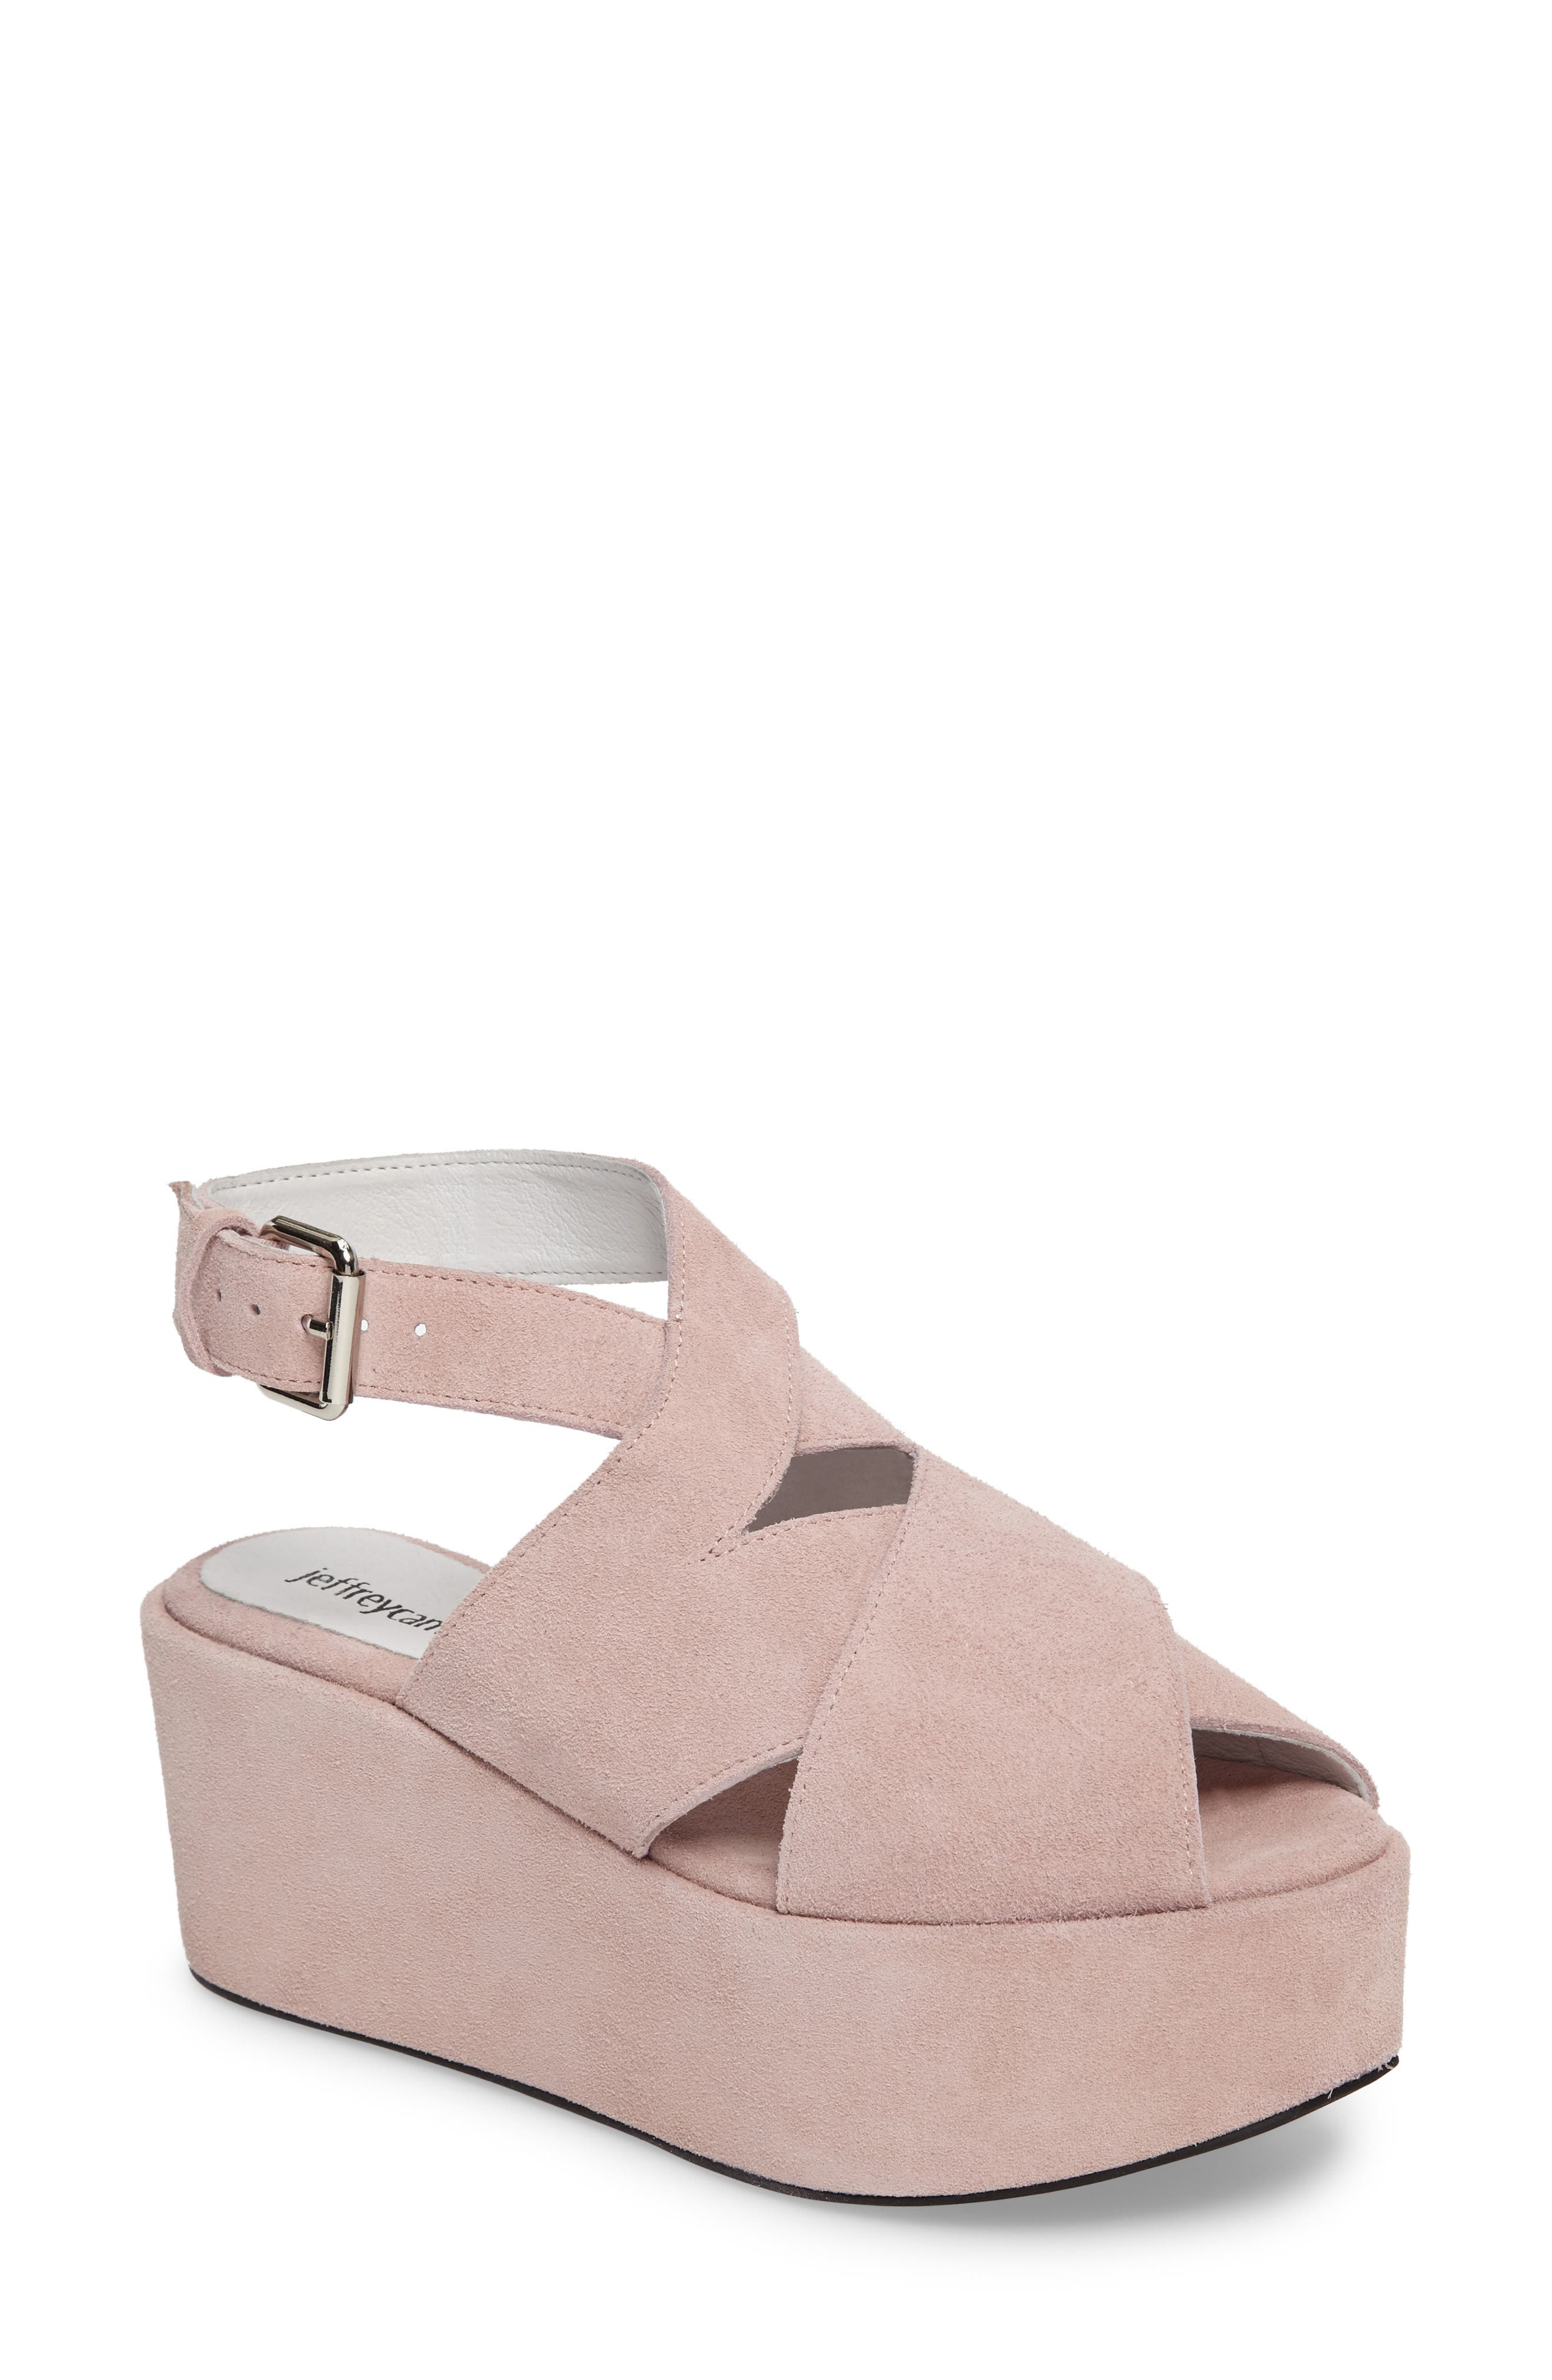 Jeffrey Campbell Larkport Slingback Platform Sandal (Women)